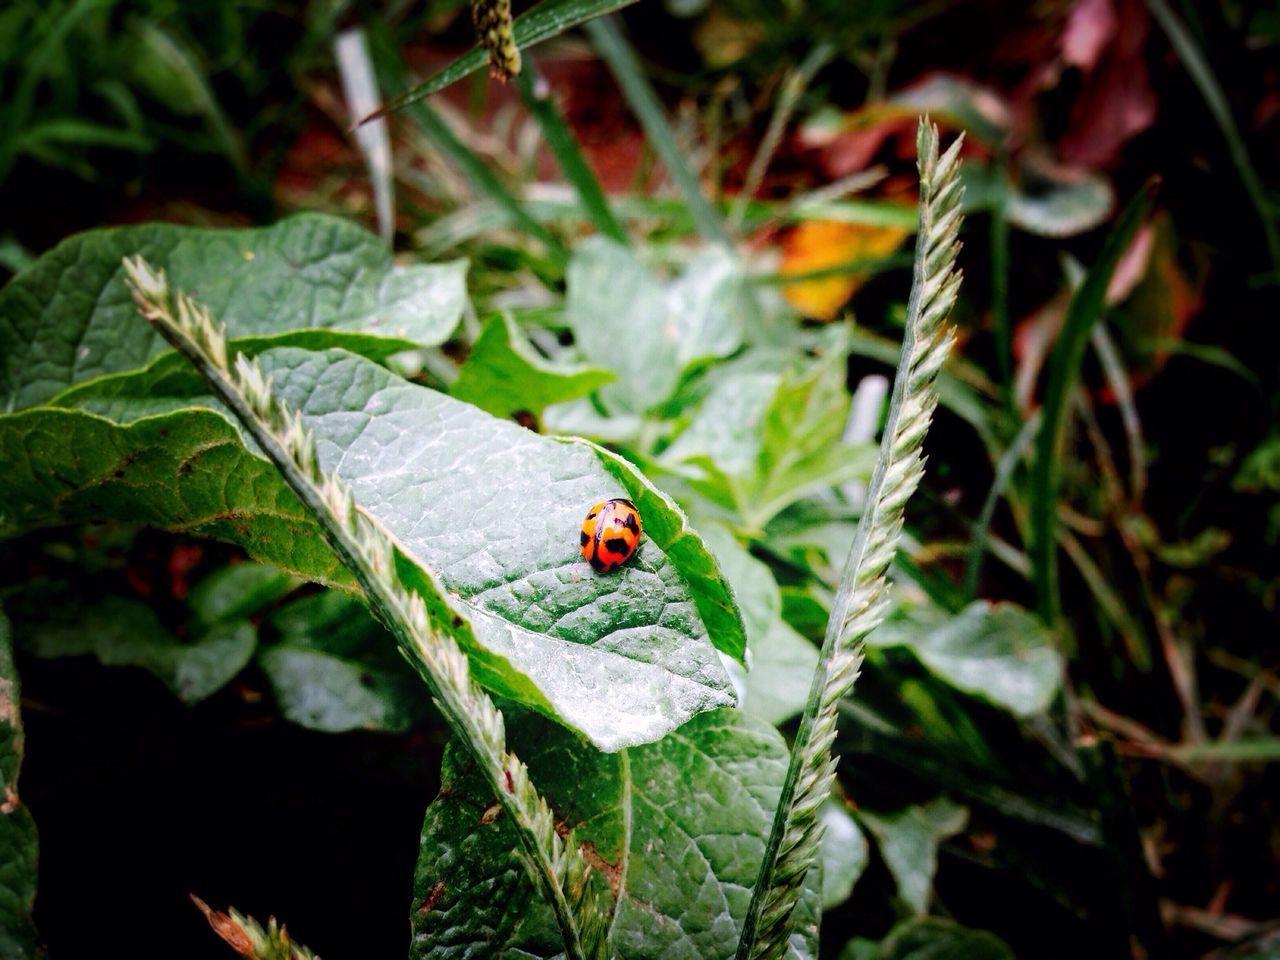 Ladybug Ladybugs Ladybug🐞 Ladybirds 🐞 Ladybird Ladybeetle